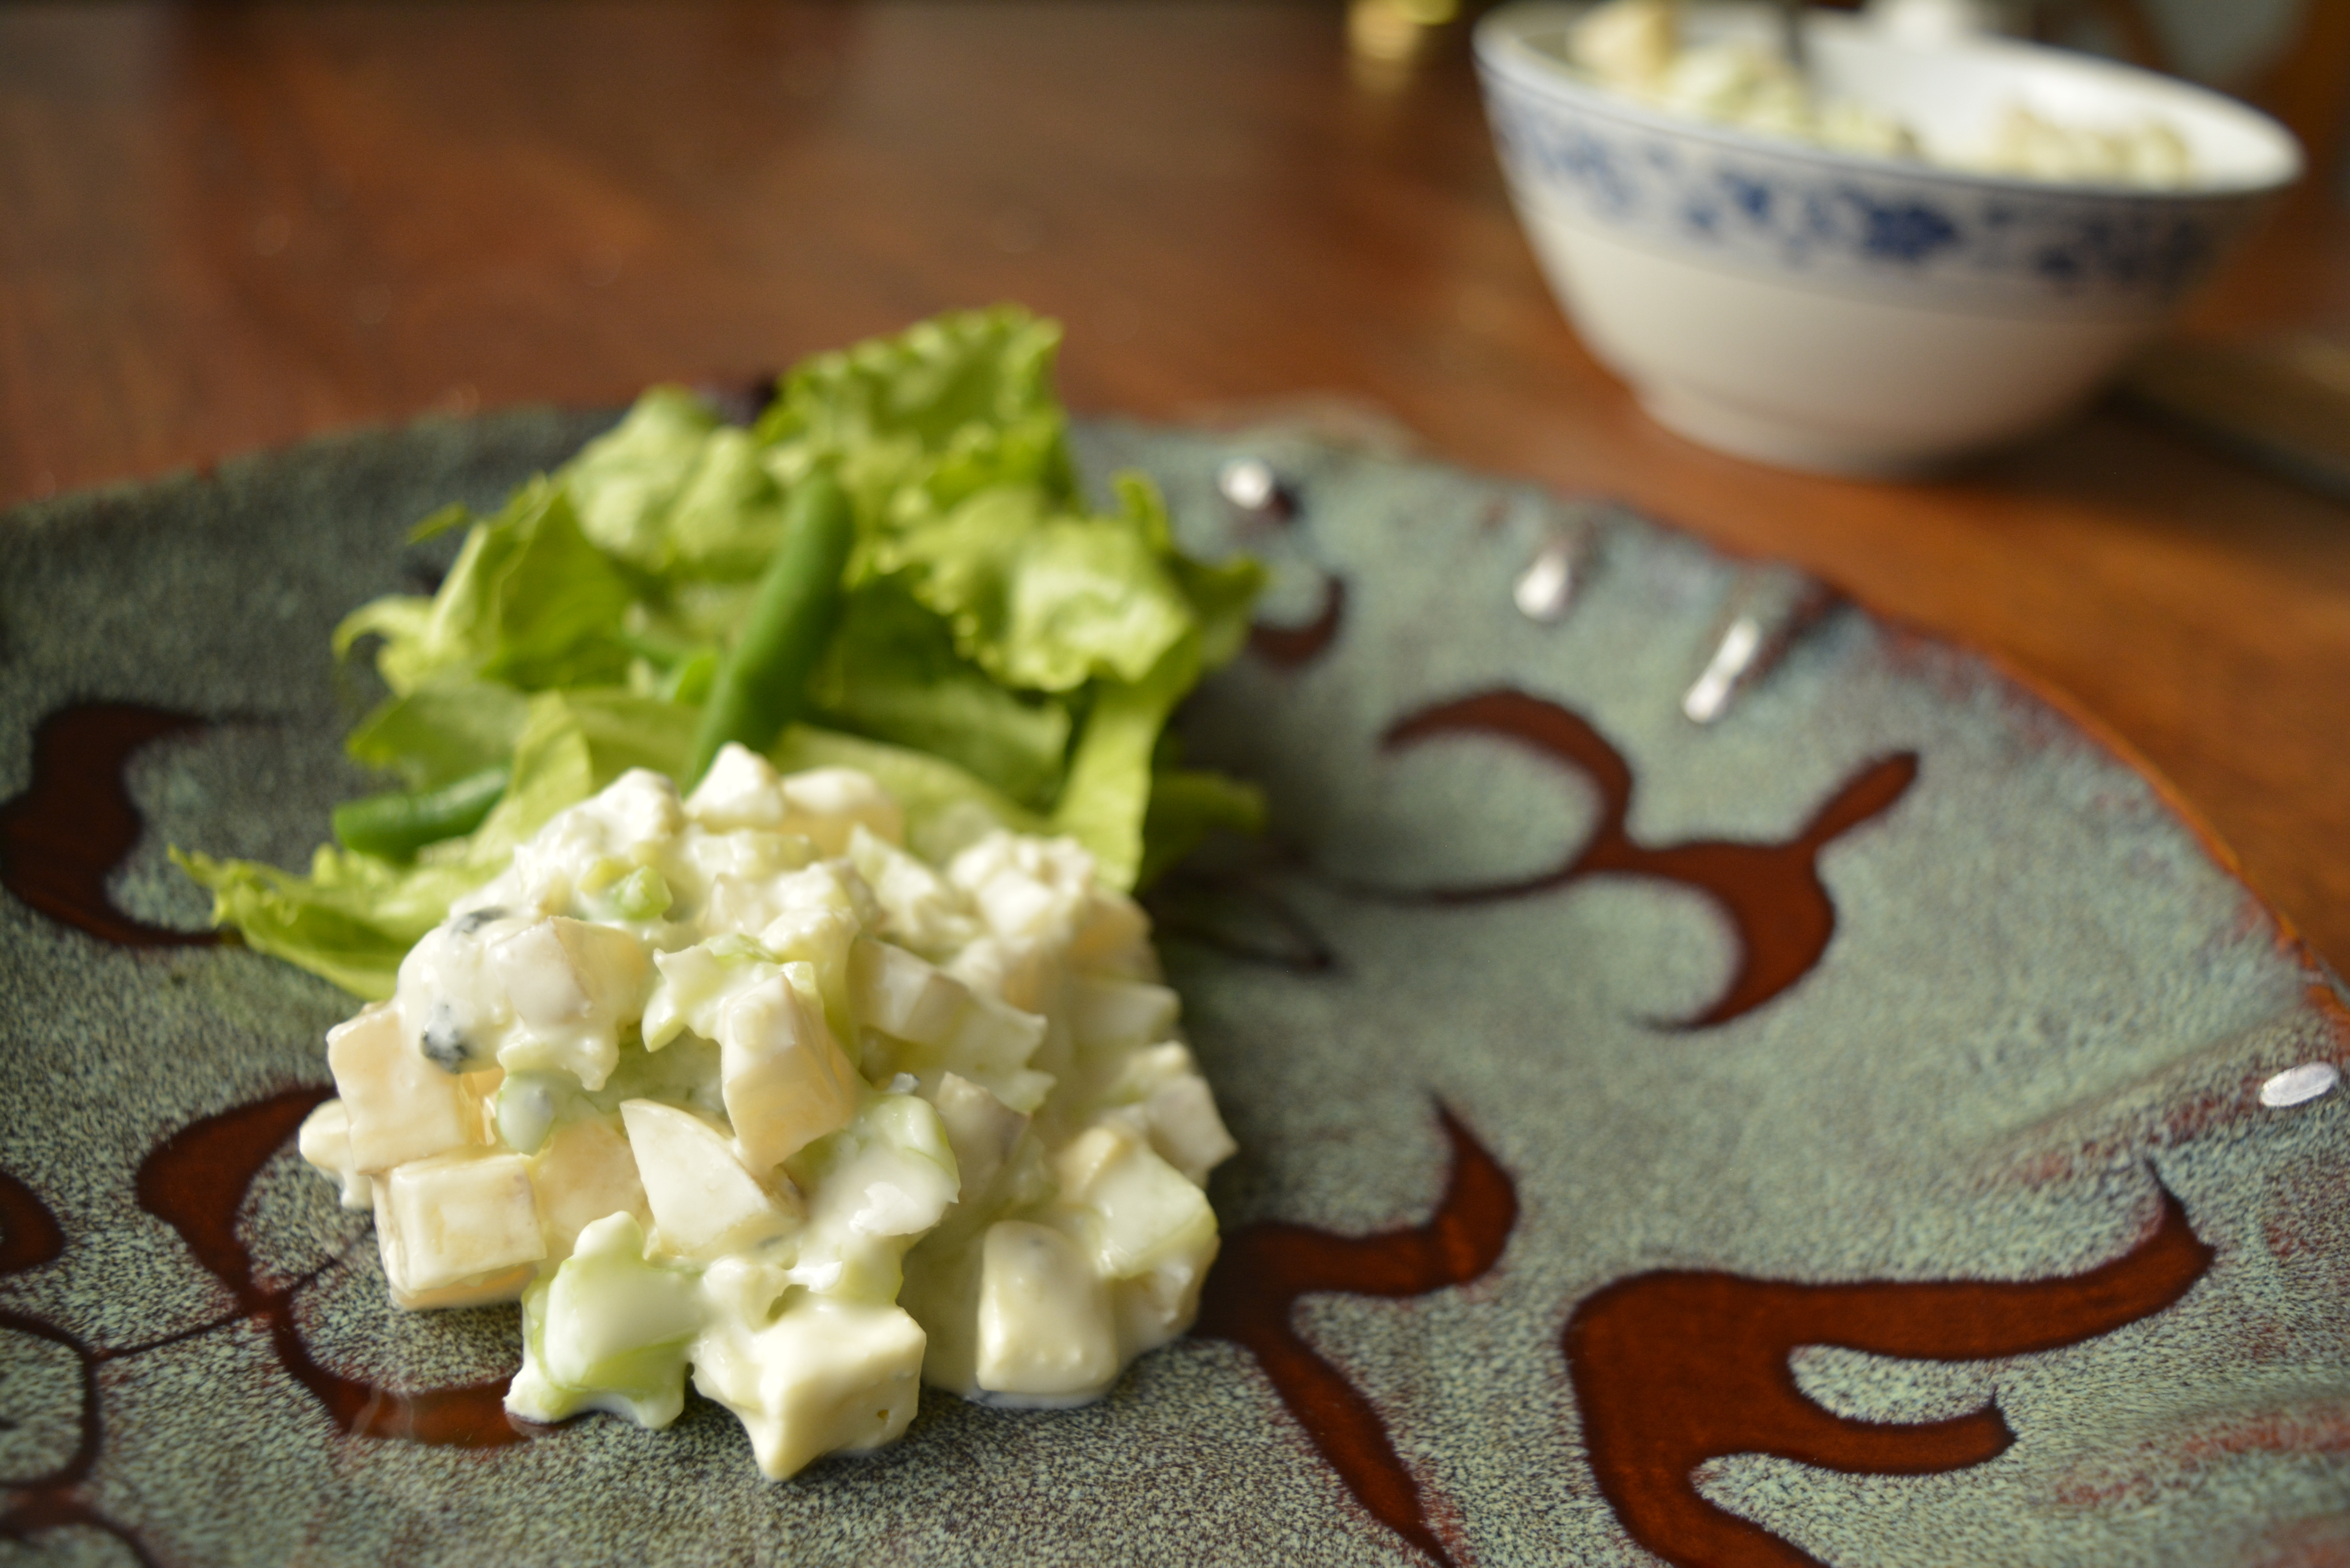 Batata yacon com molho de gorgonzola